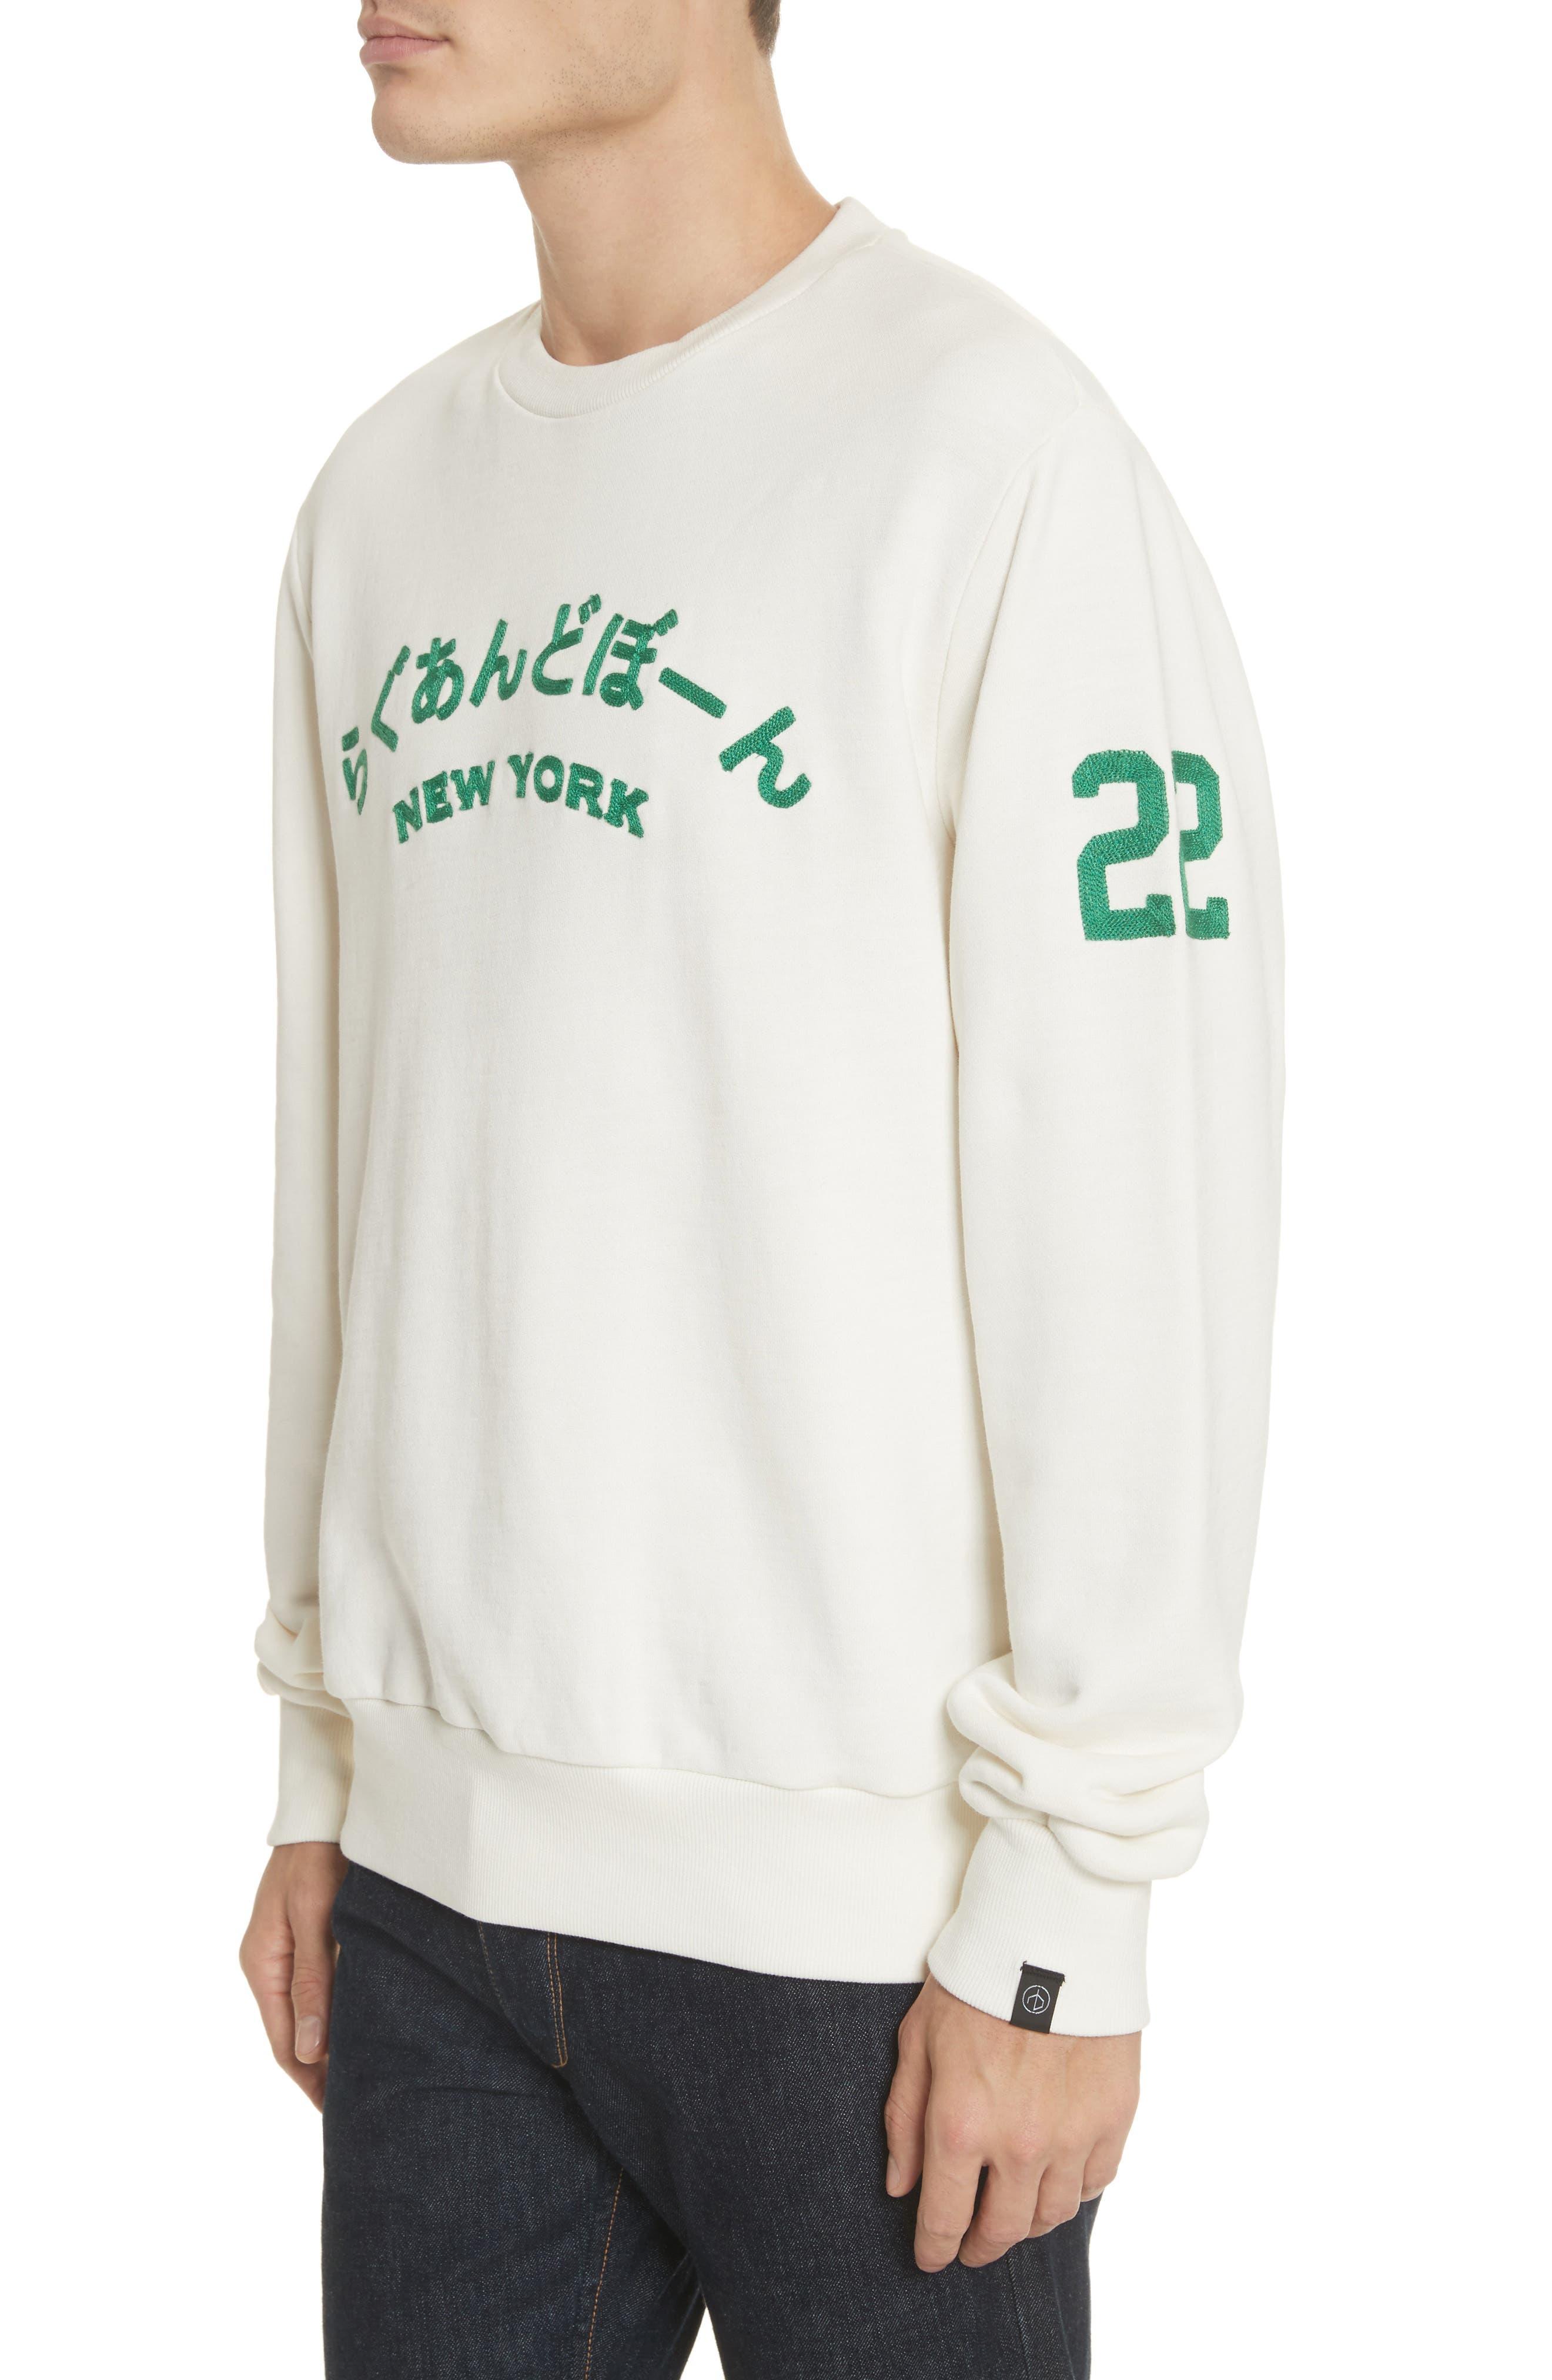 Japan Embroidered Crewneck Sweatshirt,                             Alternate thumbnail 4, color,                             900